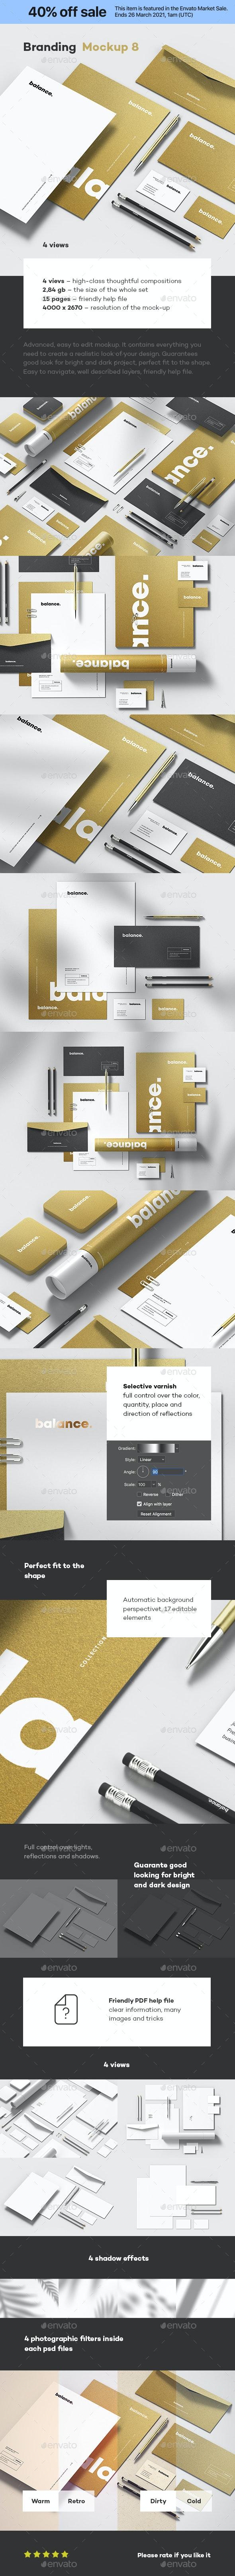 Branding Identity Mock-up 8 - Stationery Print